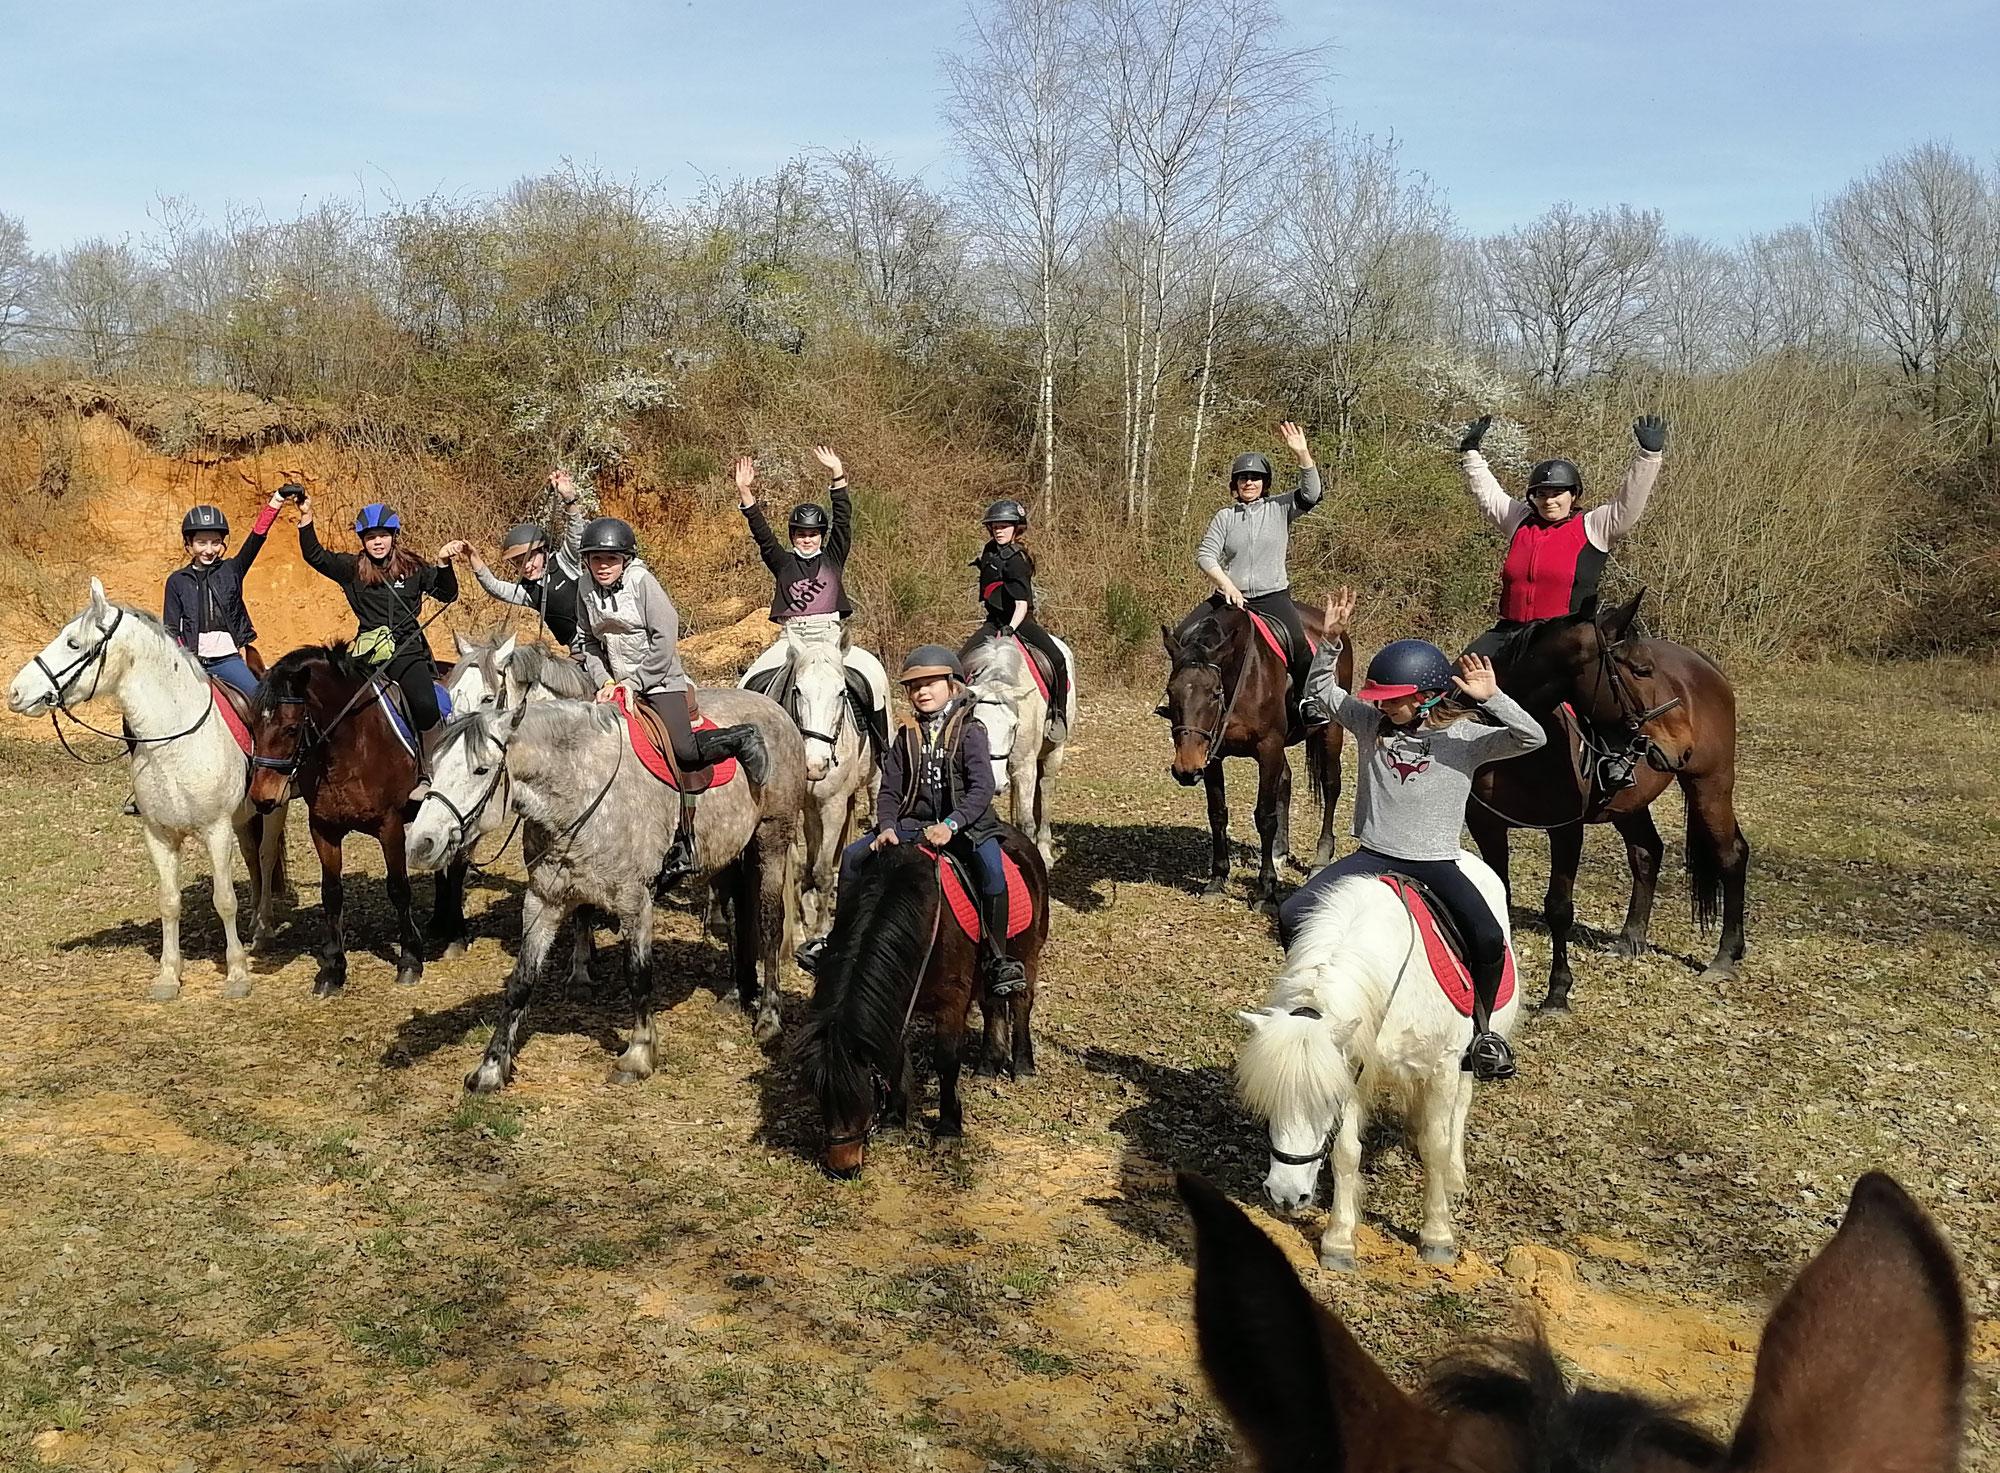 Rallye Photo à cheval...superbe !